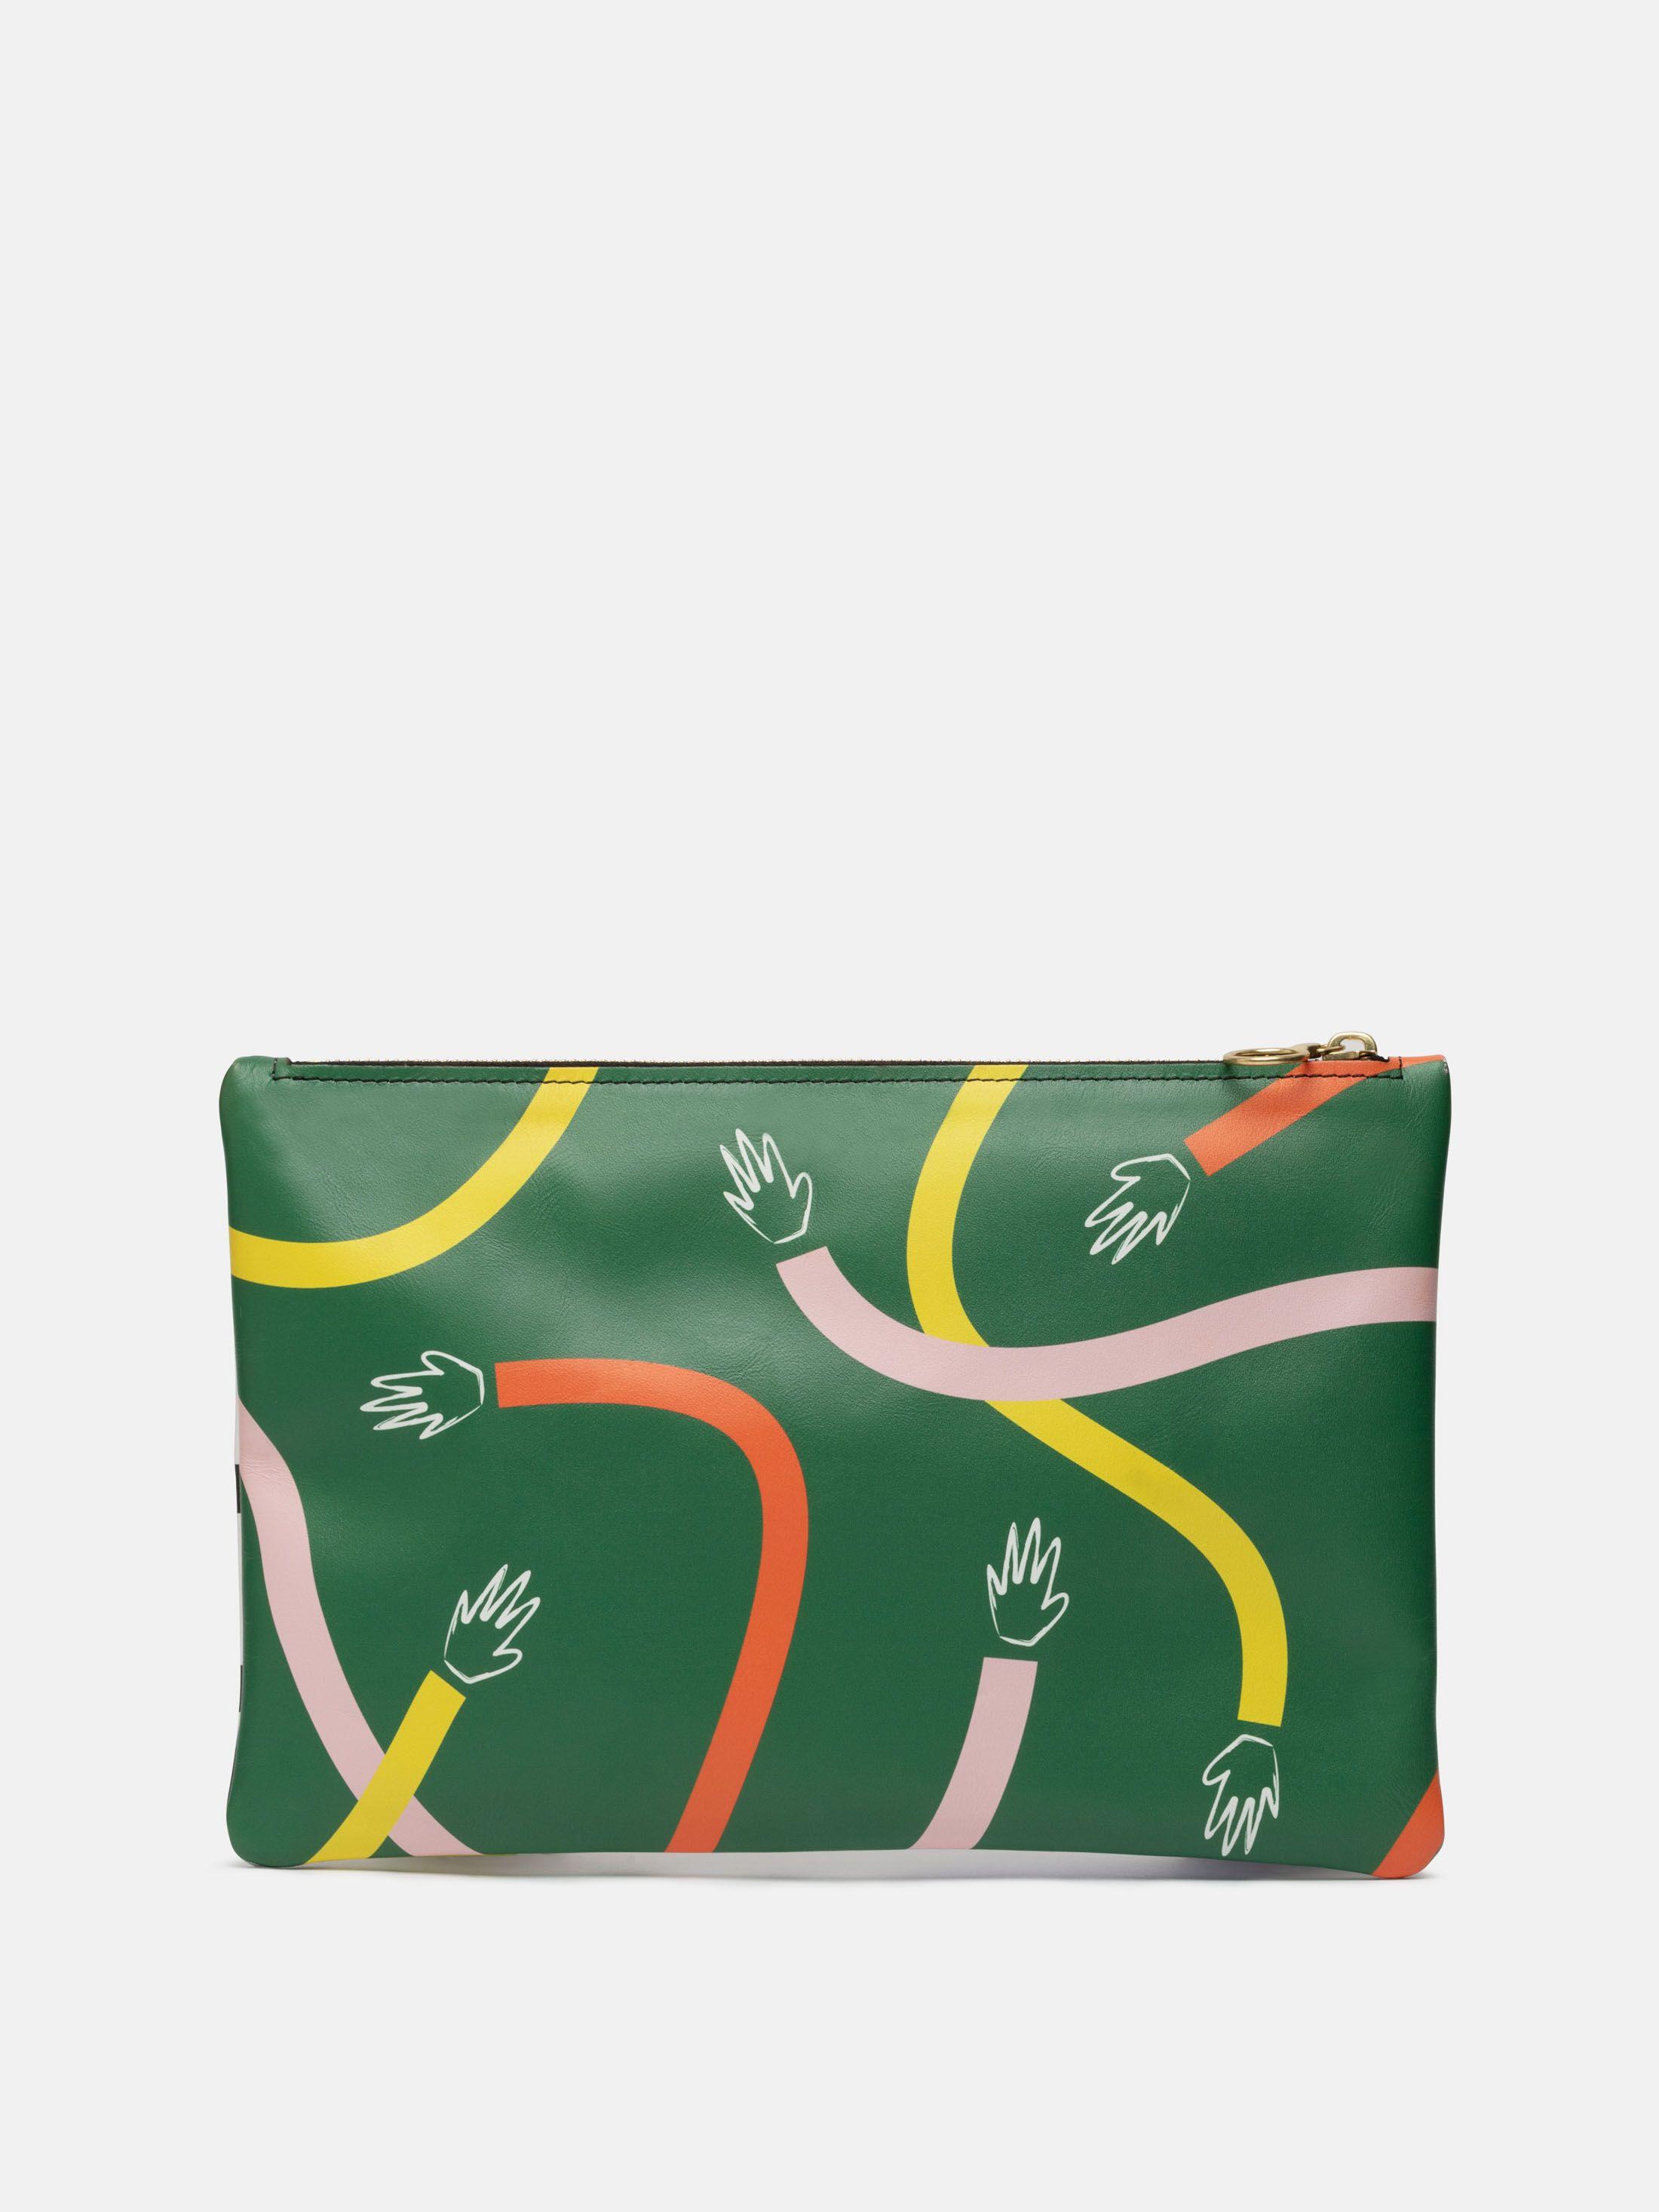 custom design leather clutch